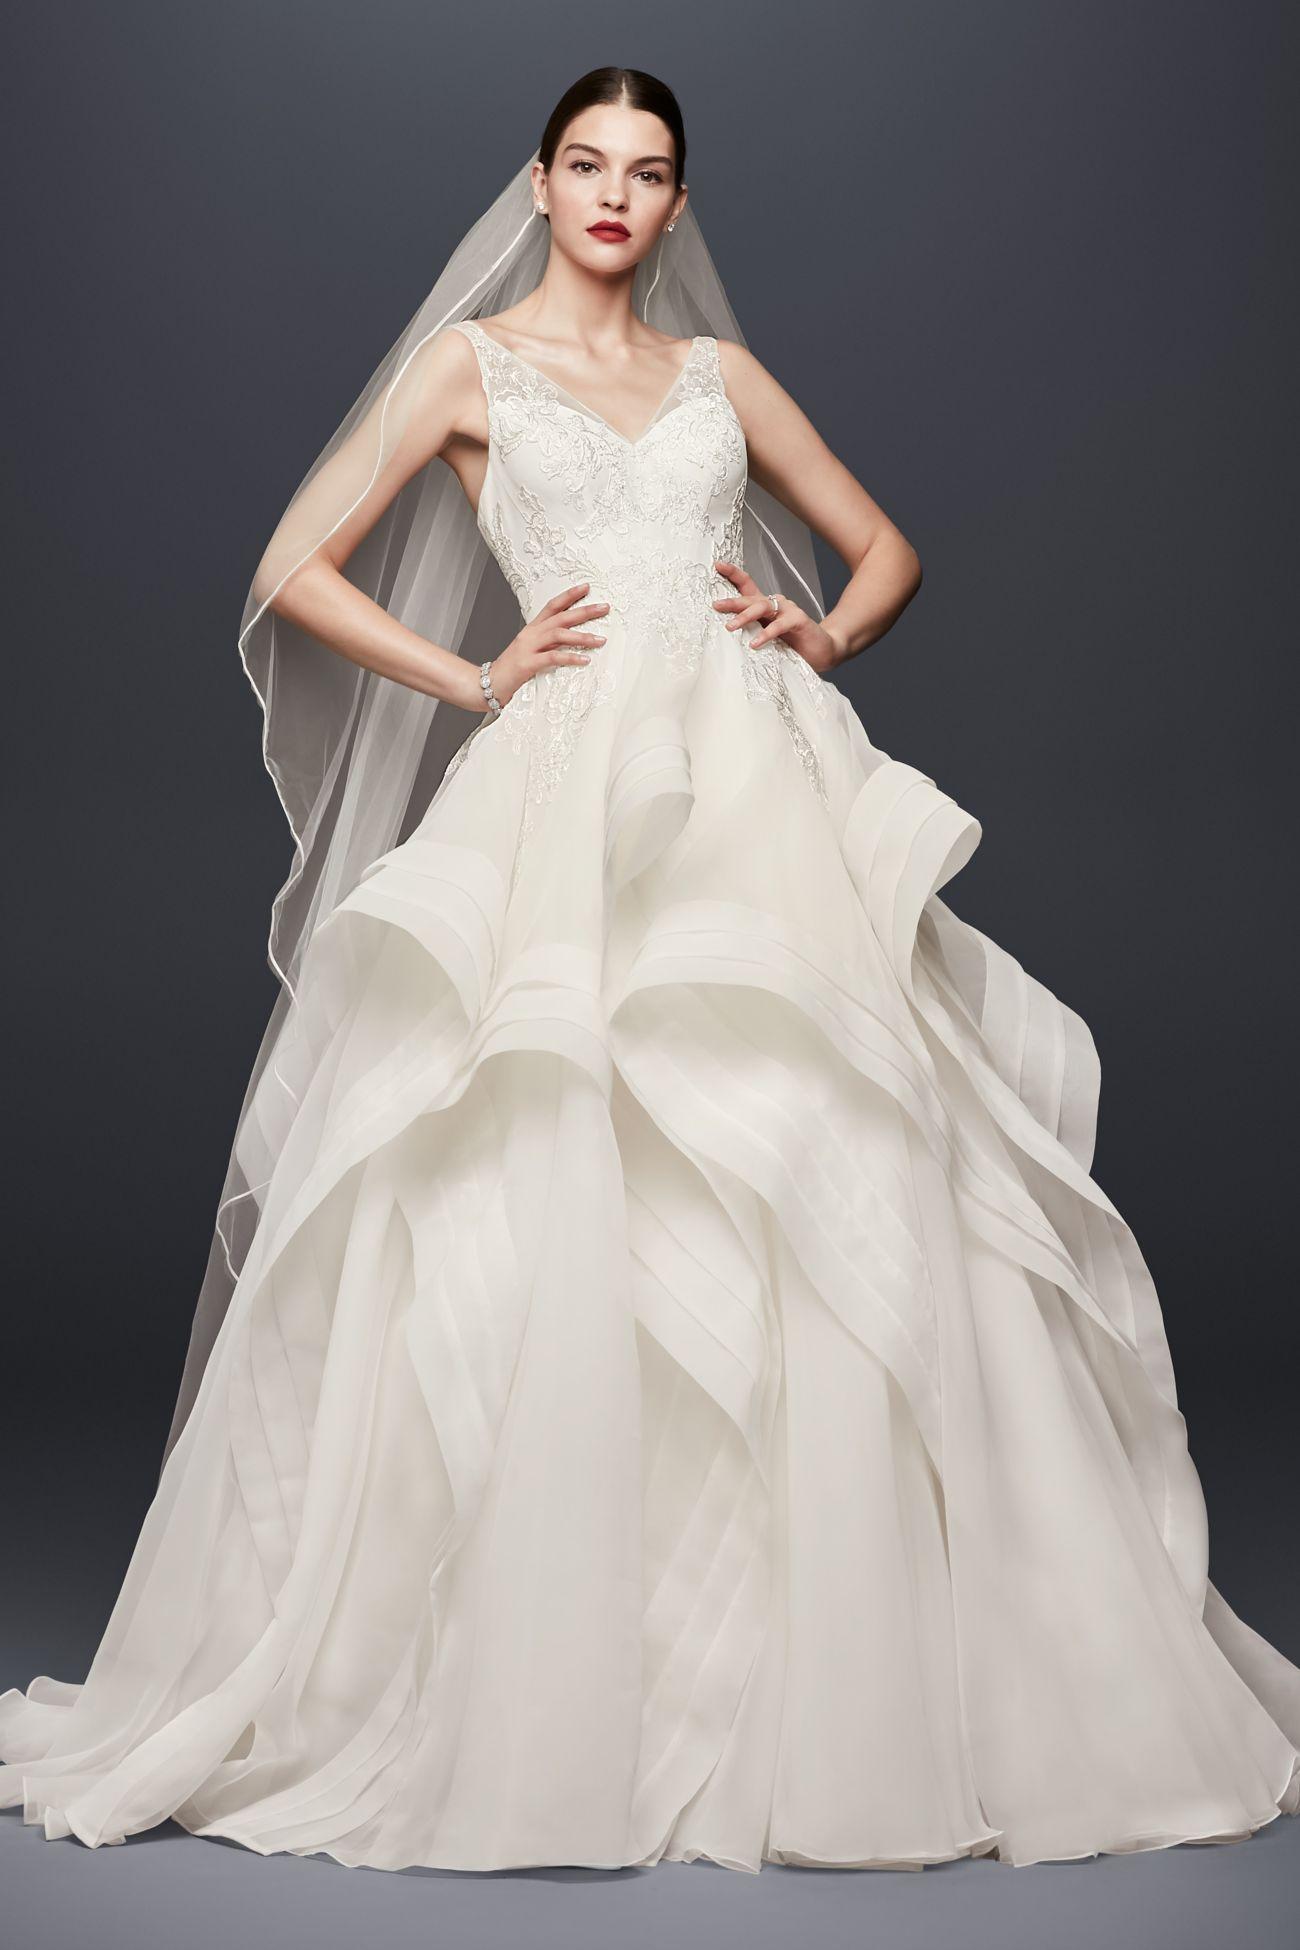 Zp341835 Glamourous Wedding Dress Ball Gowns Wedding Wedding Dress Styles [ 1950 x 1300 Pixel ]